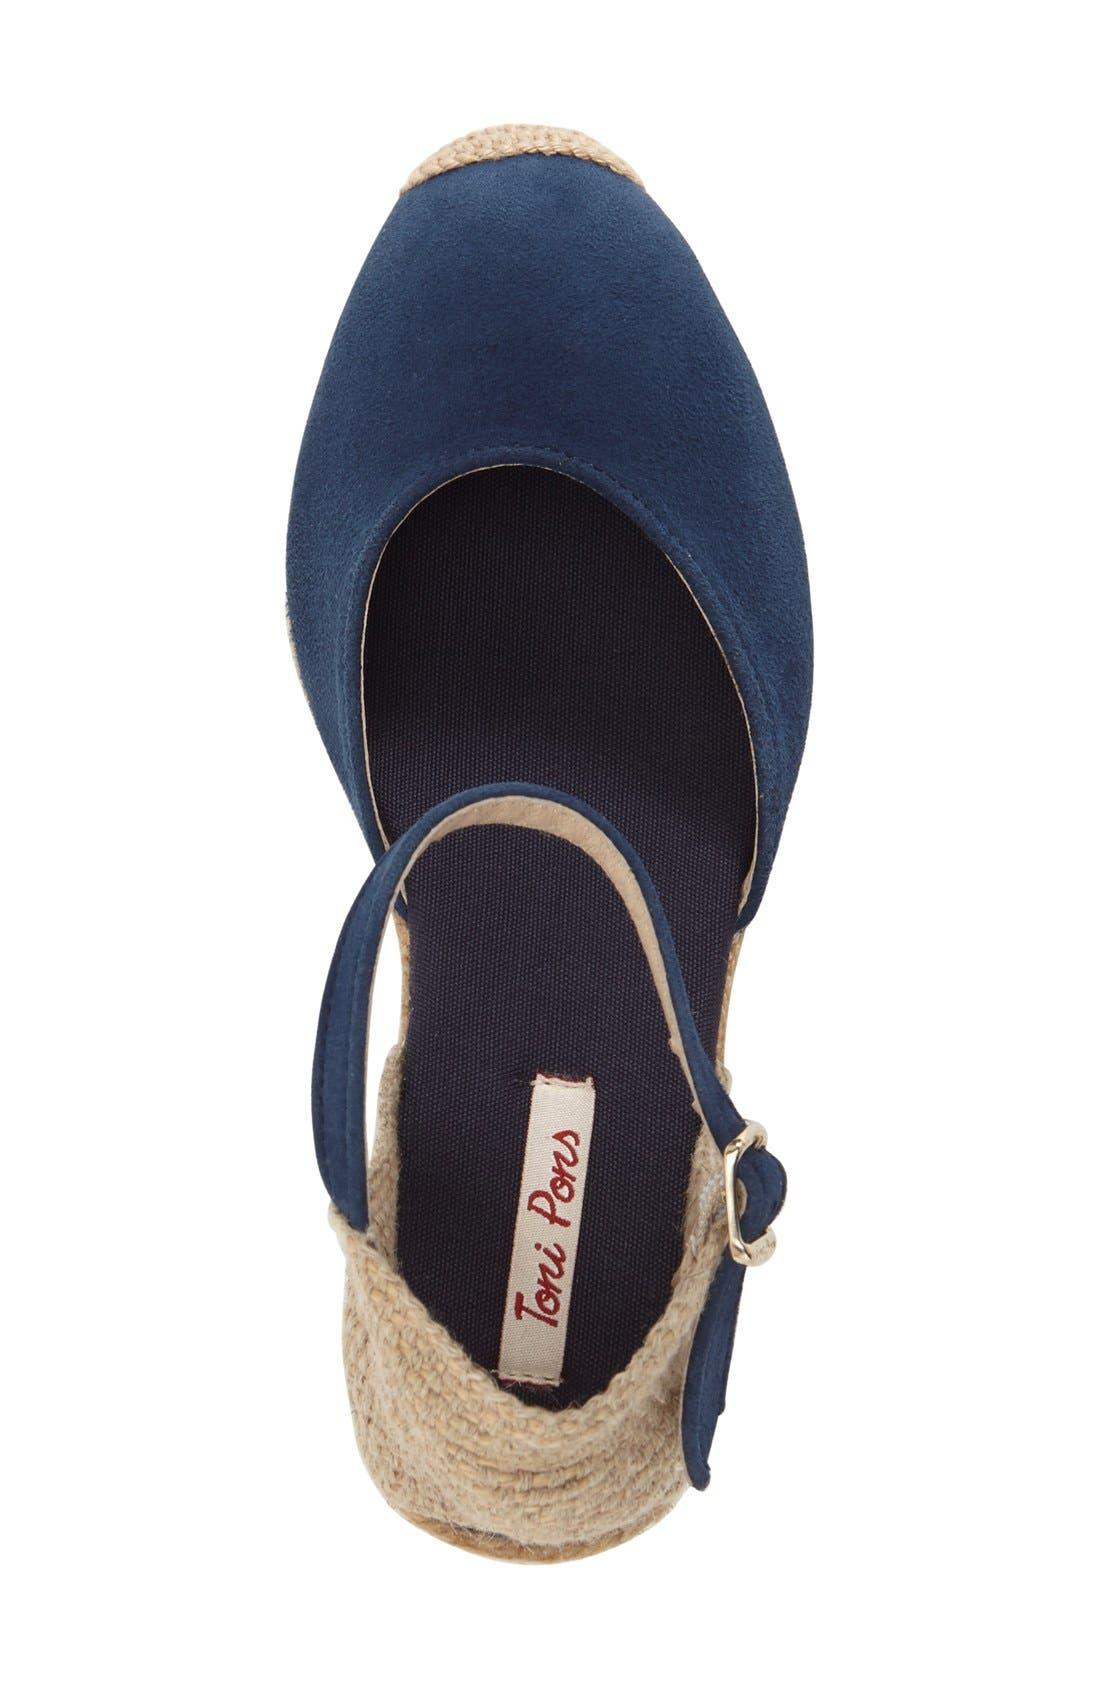 'Lloret-5' Espadrille Wedge Sandal,                             Alternate thumbnail 3, color,                             NAVY SUEDE